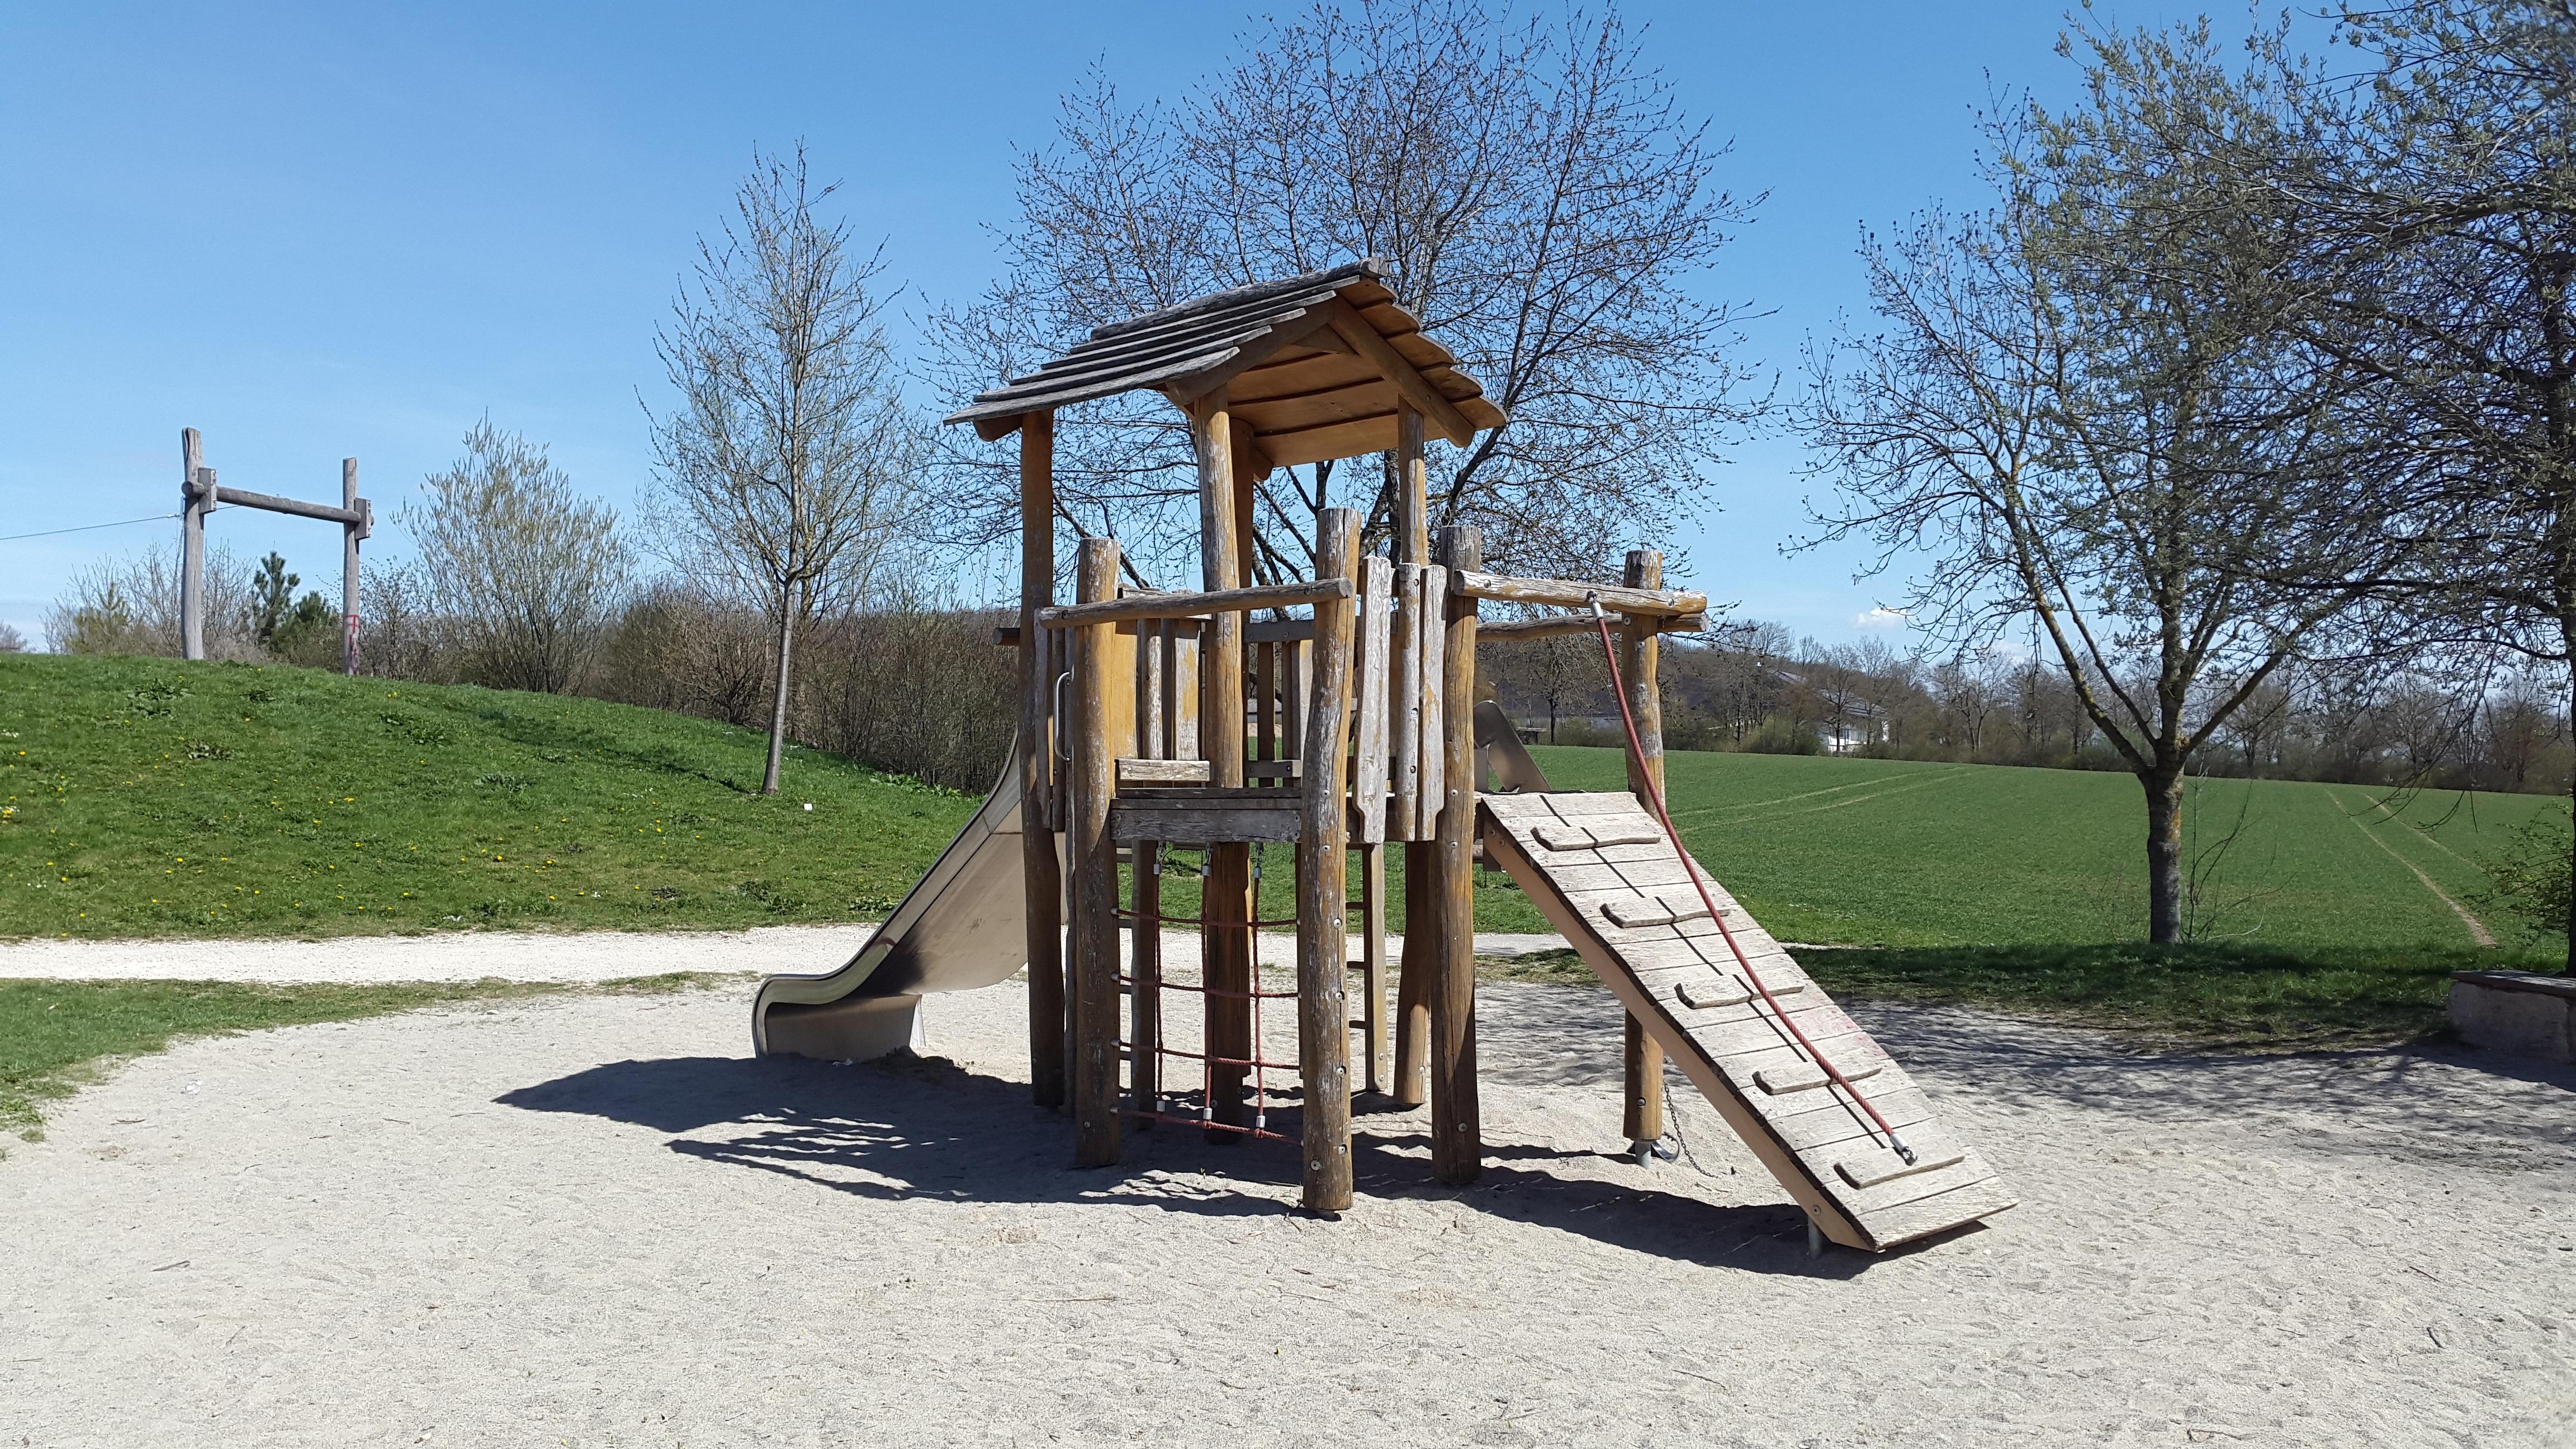 oscilacin espacio publico patio de recreo dispositivo de juego parque infantil pozo de arena kletterhaus recreacin al aire libre para nios